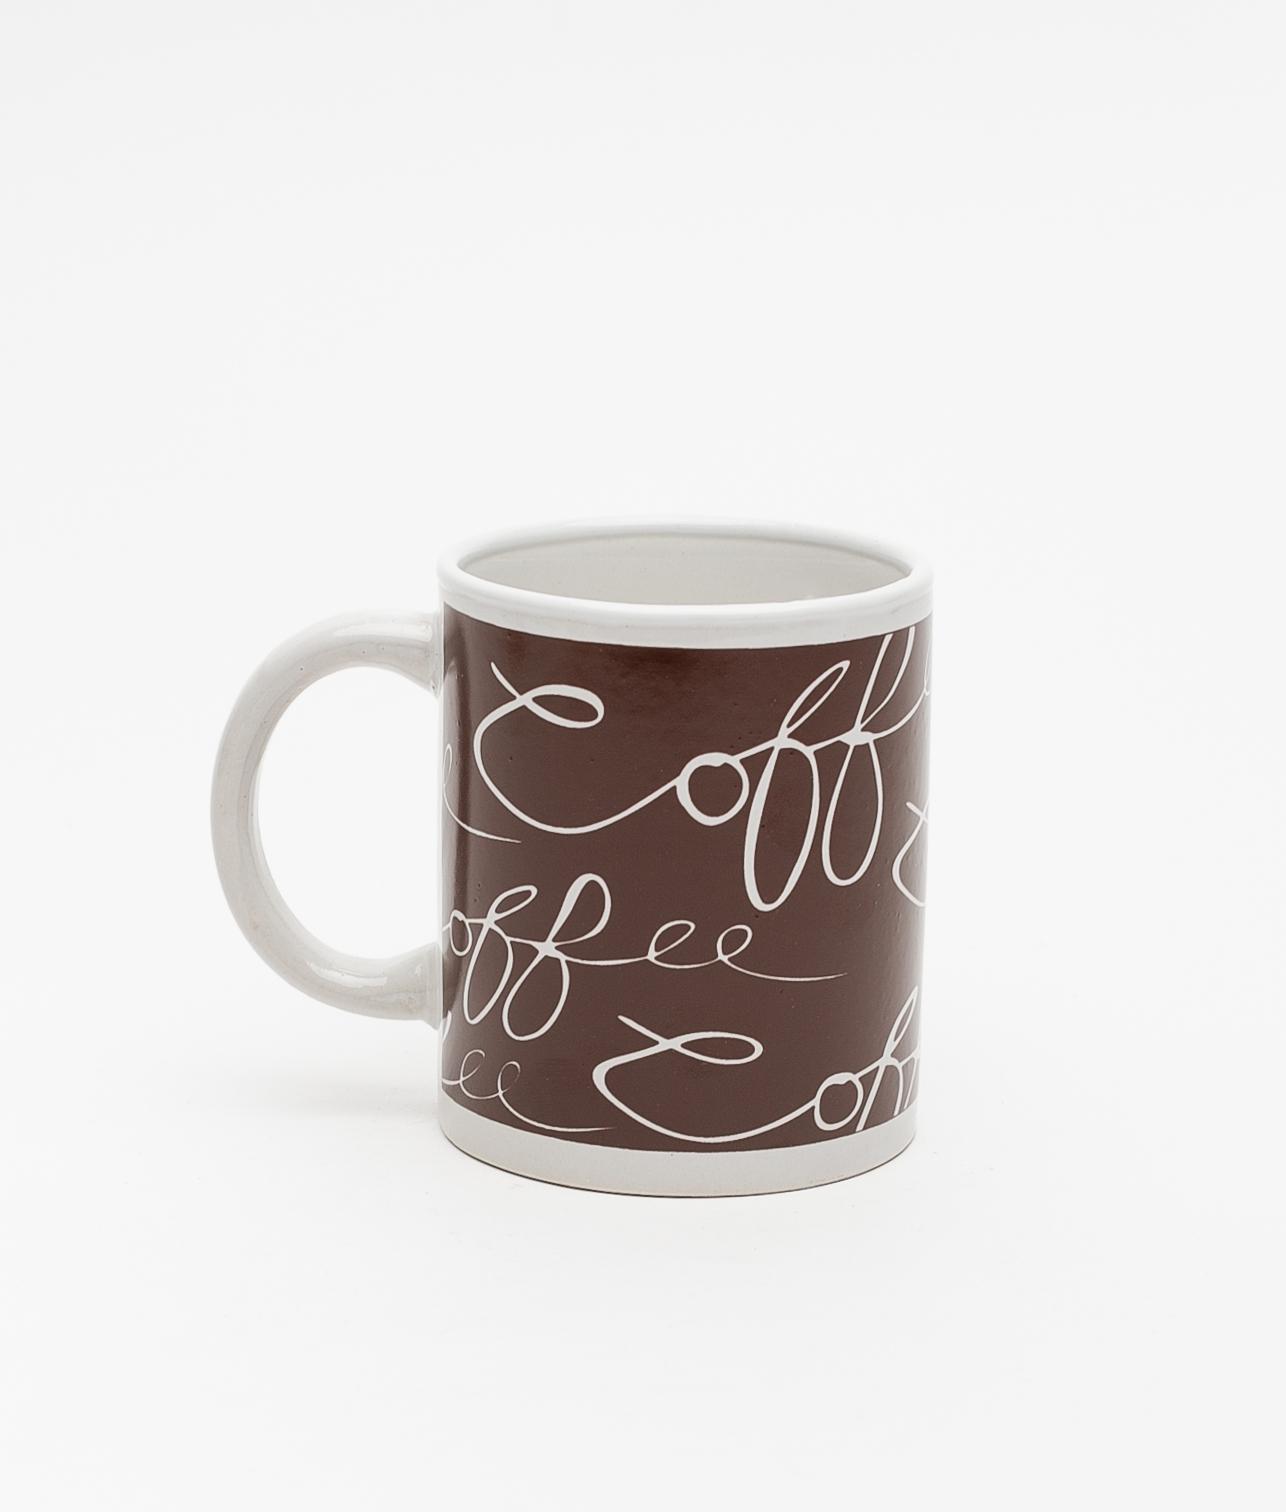 TAZA FEME COFFEE - BROWN